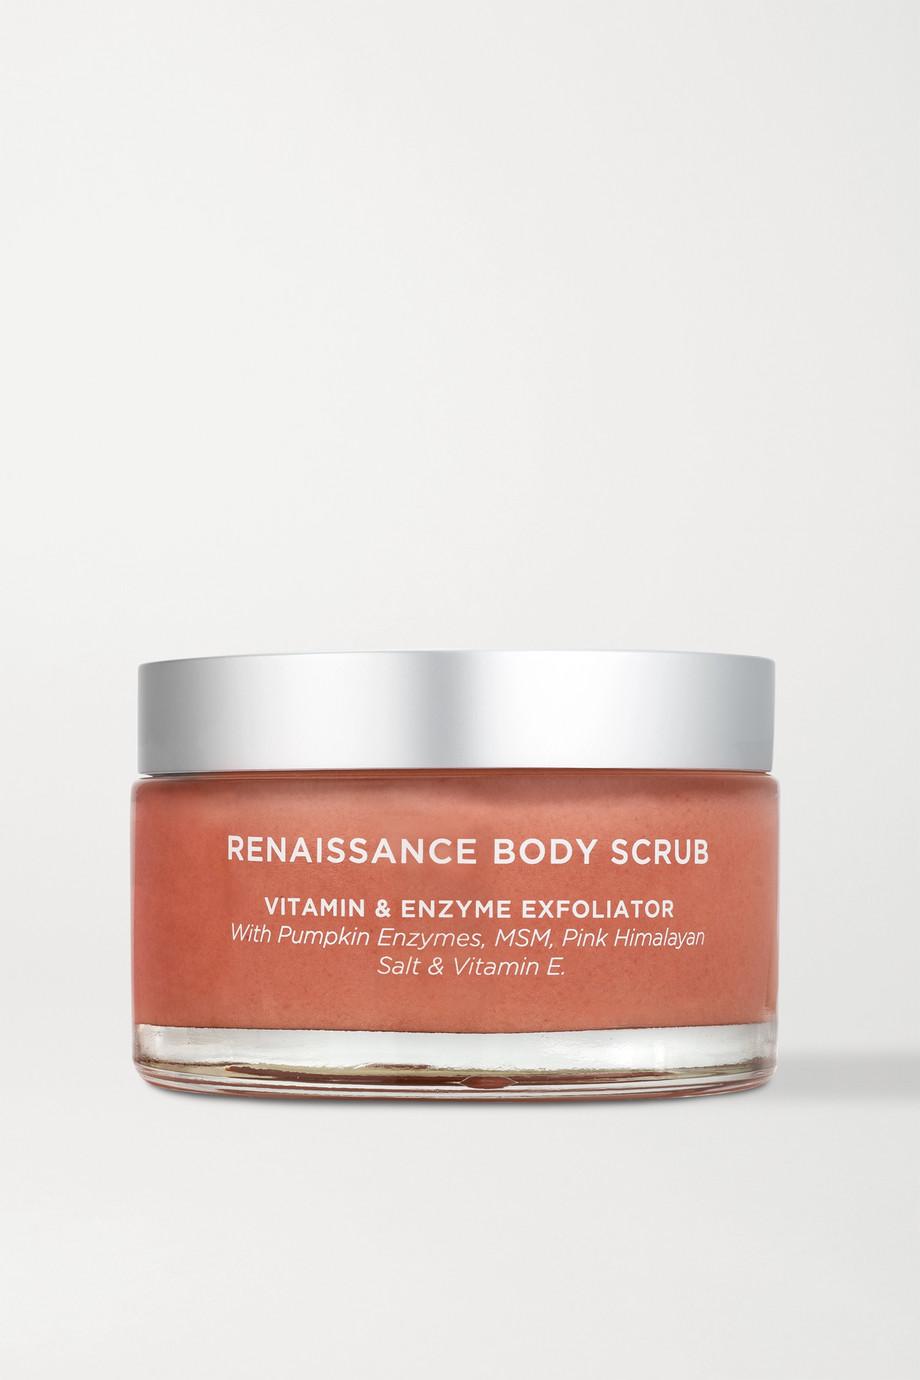 Oskia Renaissance Body Scrub, 220g